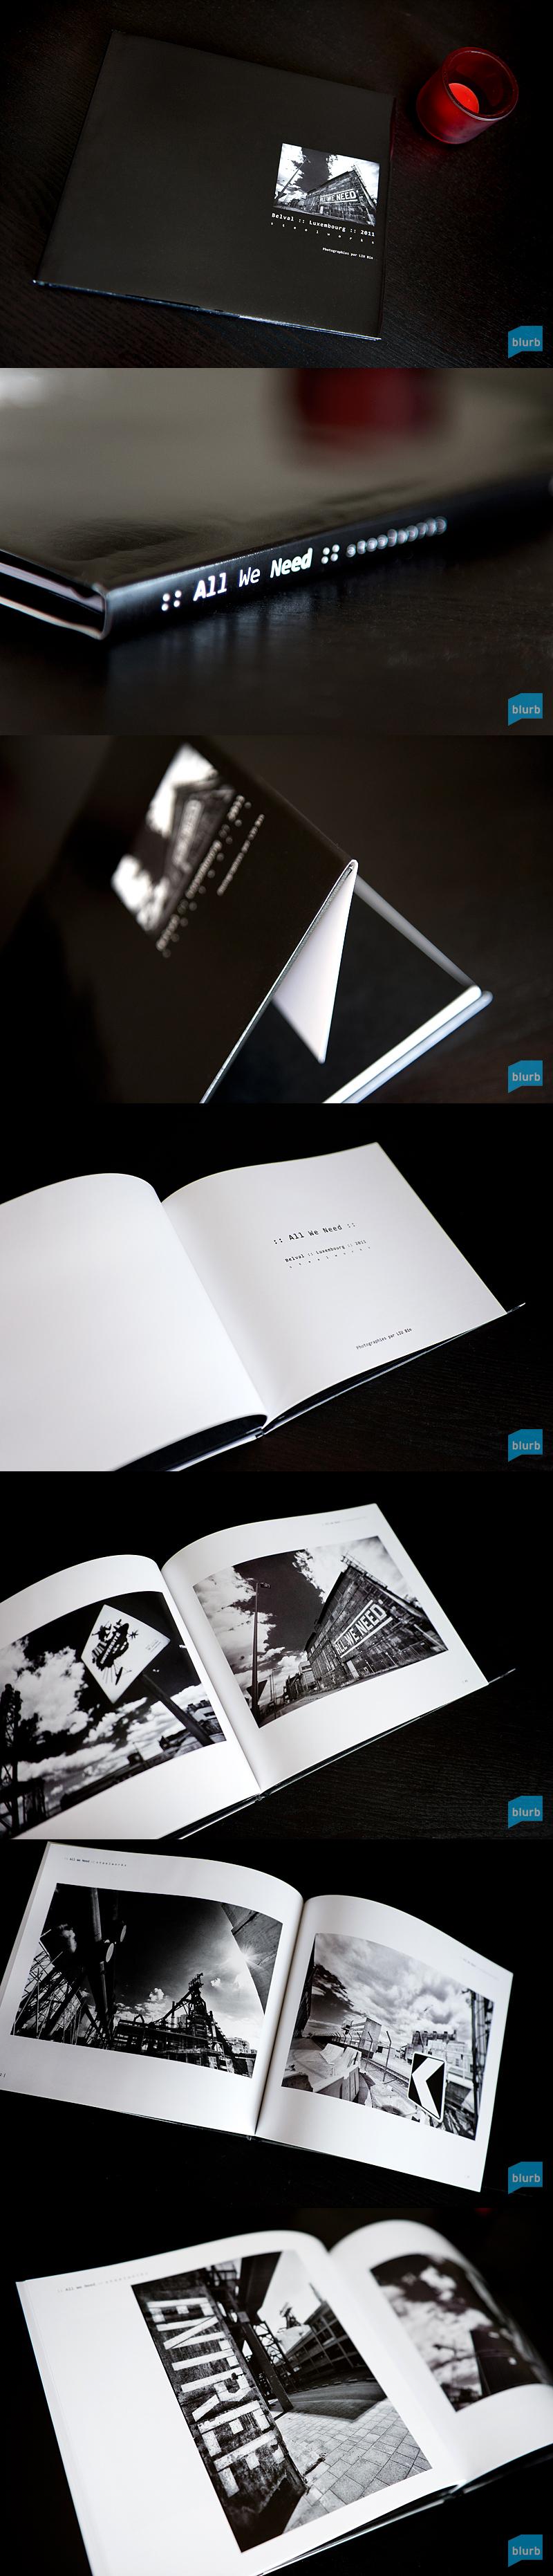 Blurb Book Light Room Grid Means